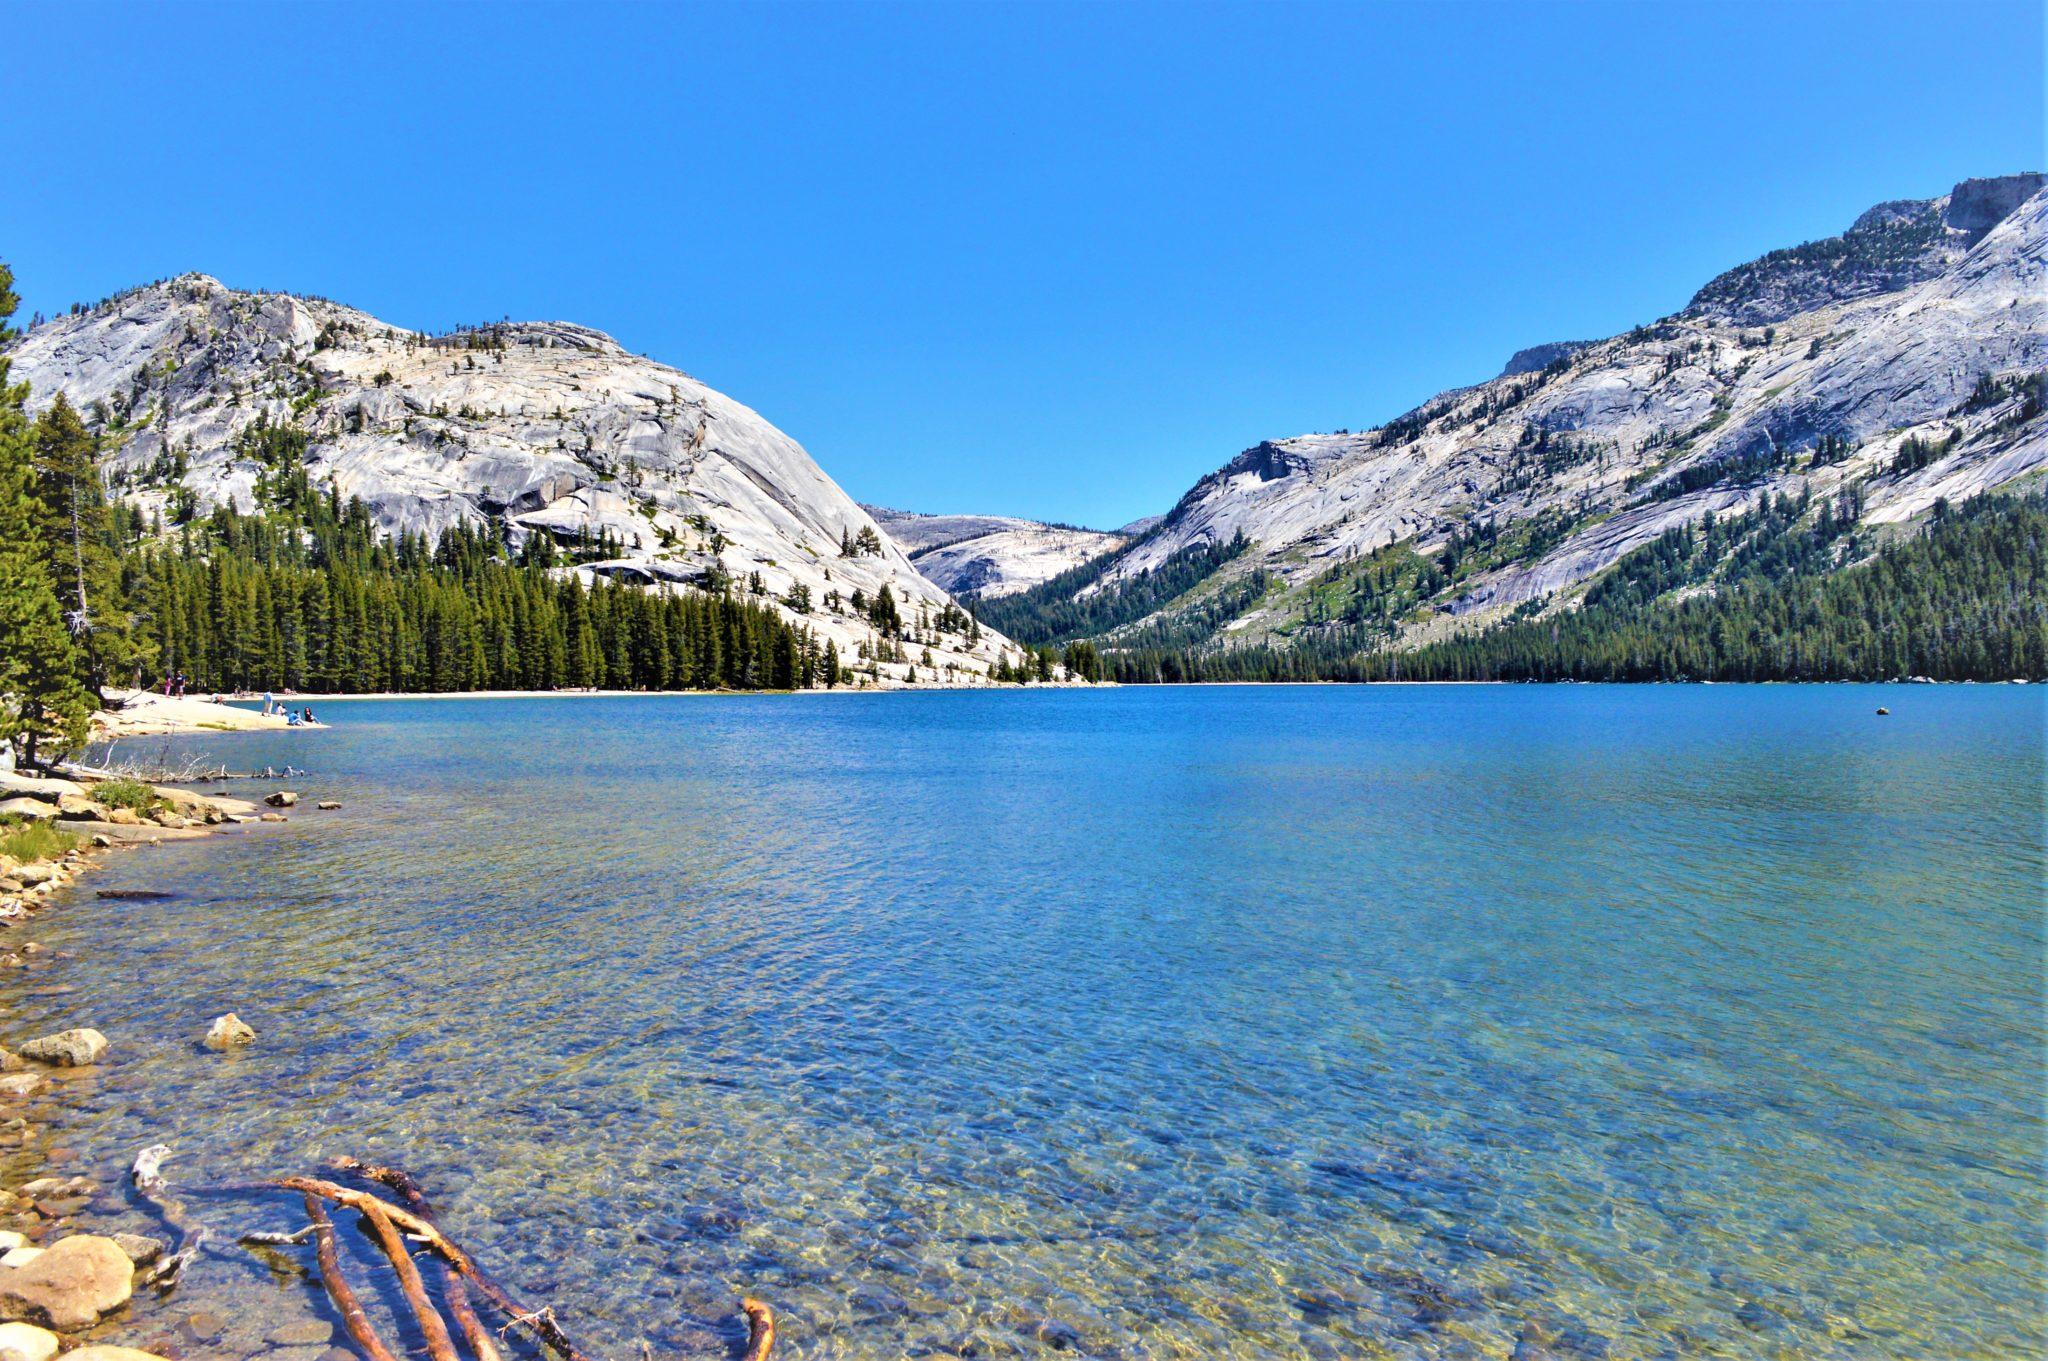 lakeview, Yosemite National Park, California USA